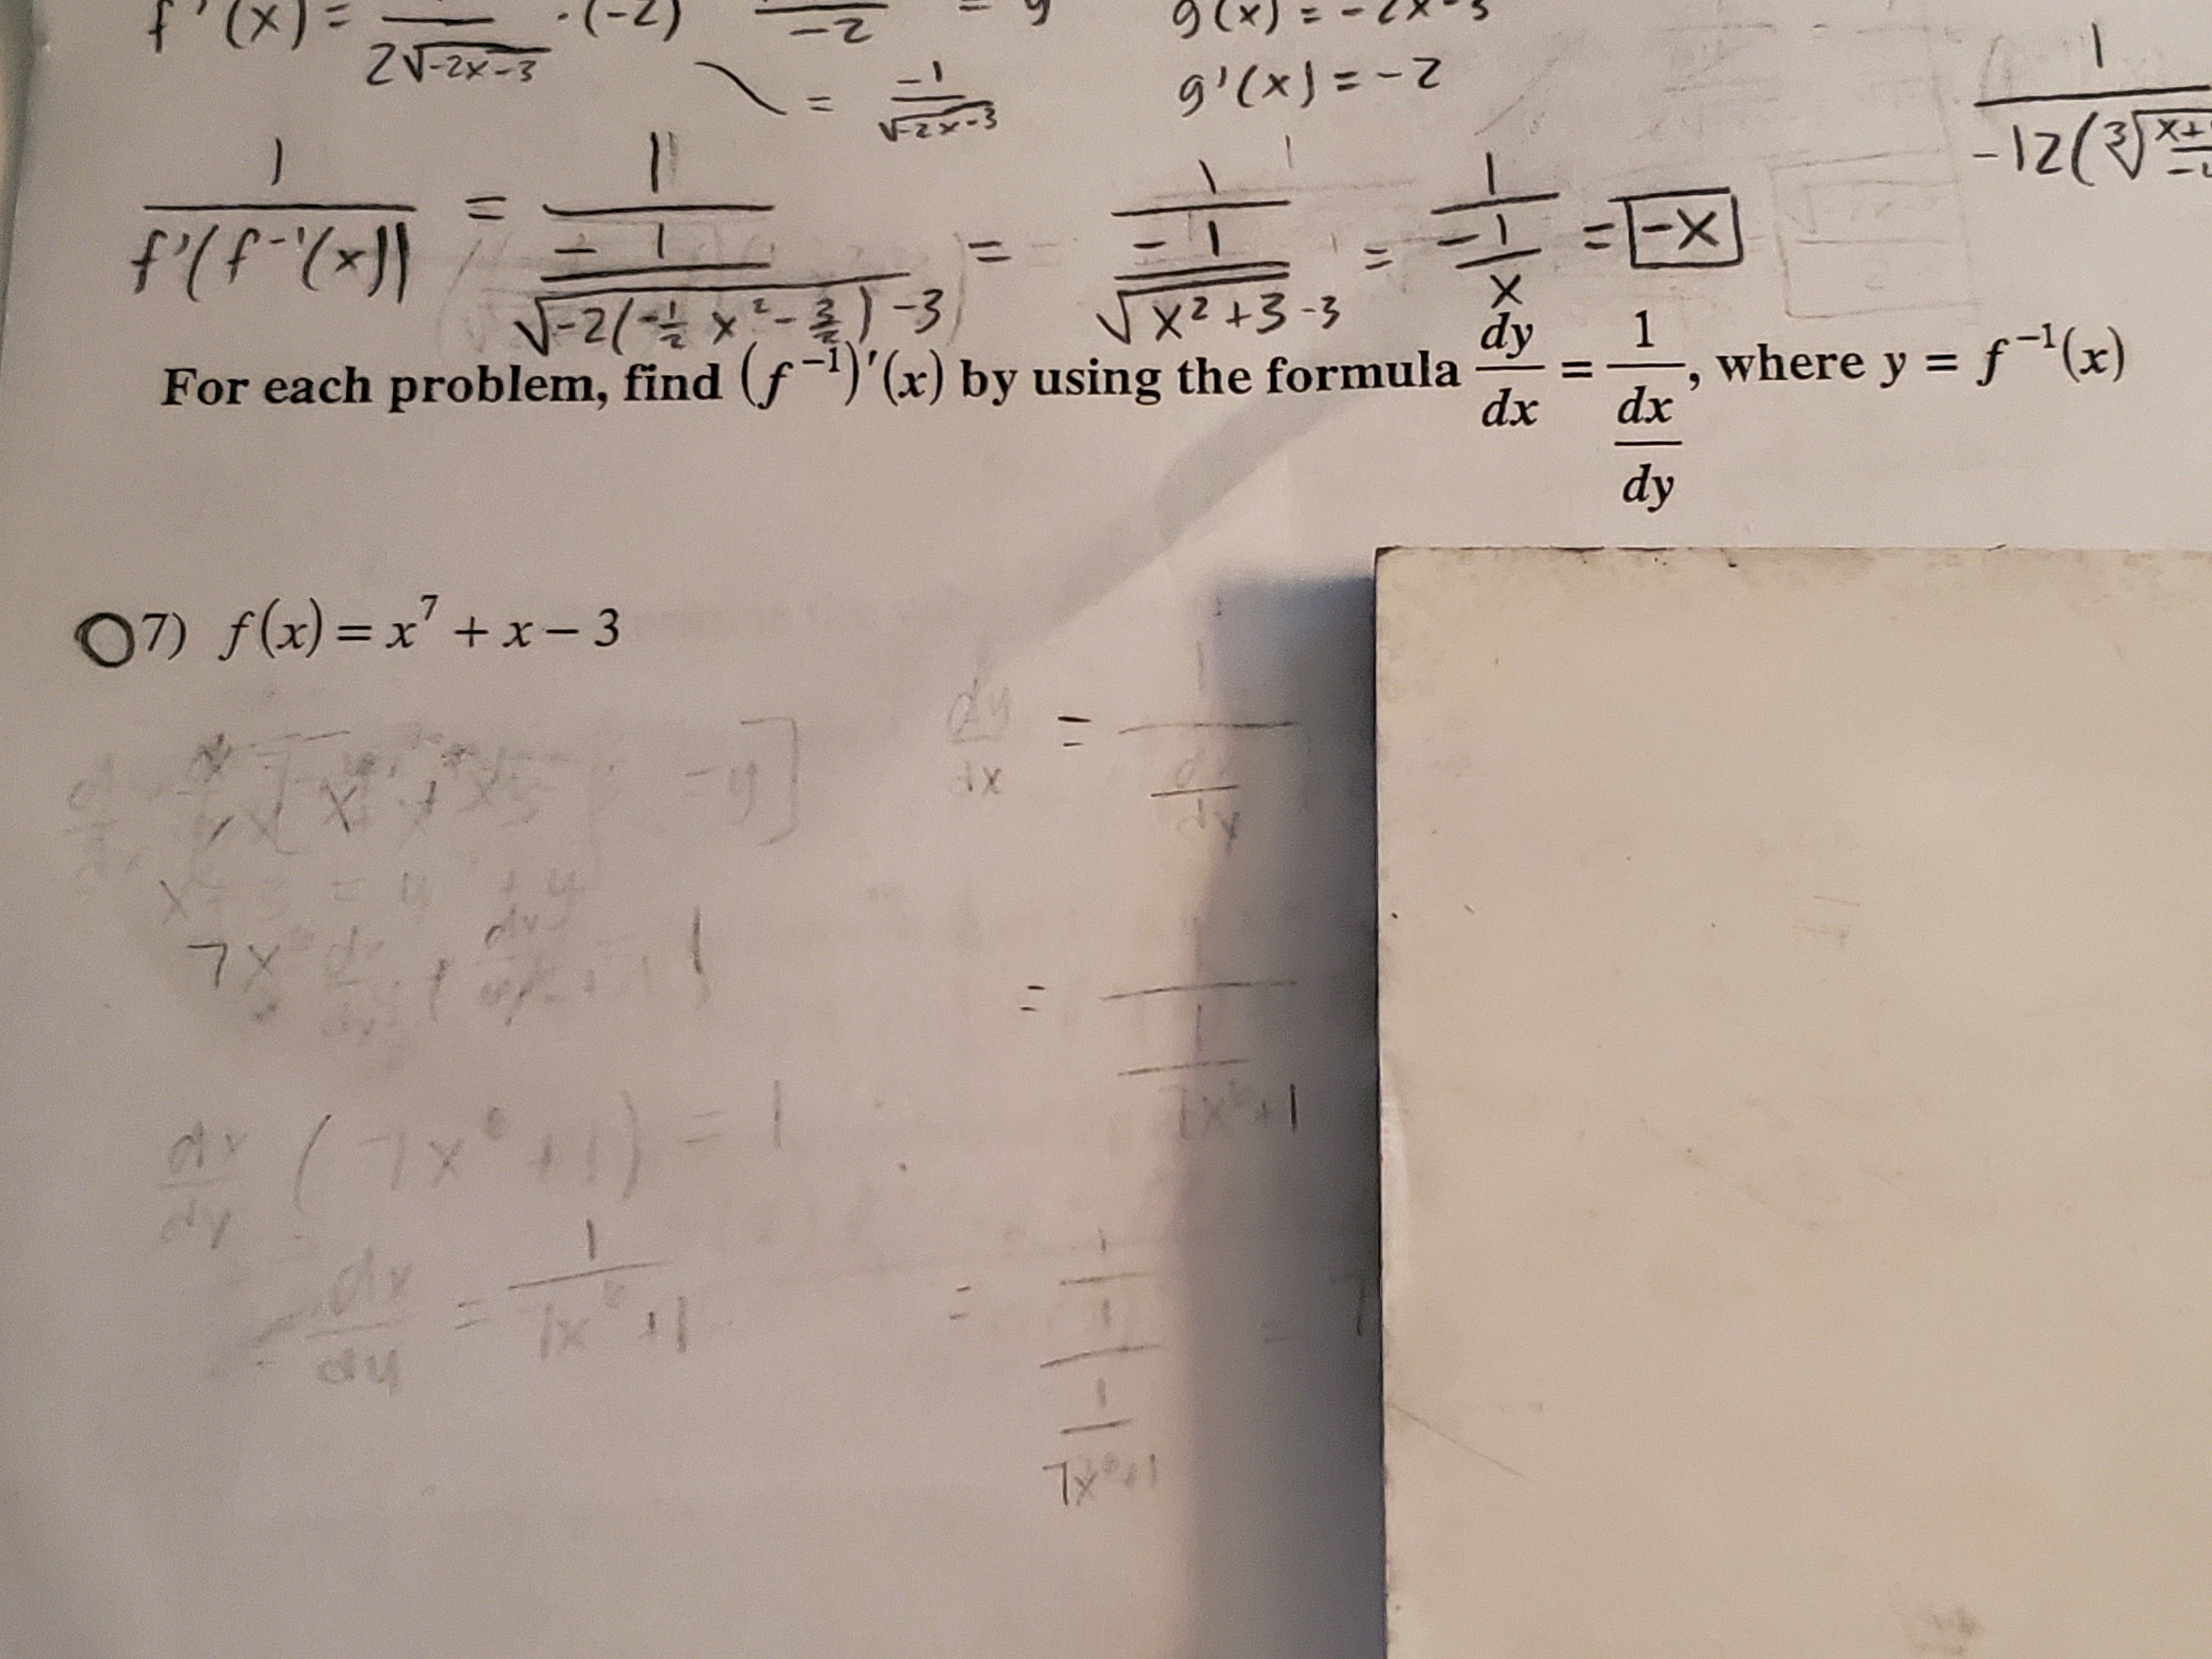 ZV-2x-8 g'(xJ=Z ) -1z( f(P EX N-2 3 2- Et zX For each problem, find (f)'(x) by using the formula dy 1 where y f(x) dx dx dy 07) f(x)= x + x-3 ax dly 7 X (ל'אר) - dy 7x 1/ U